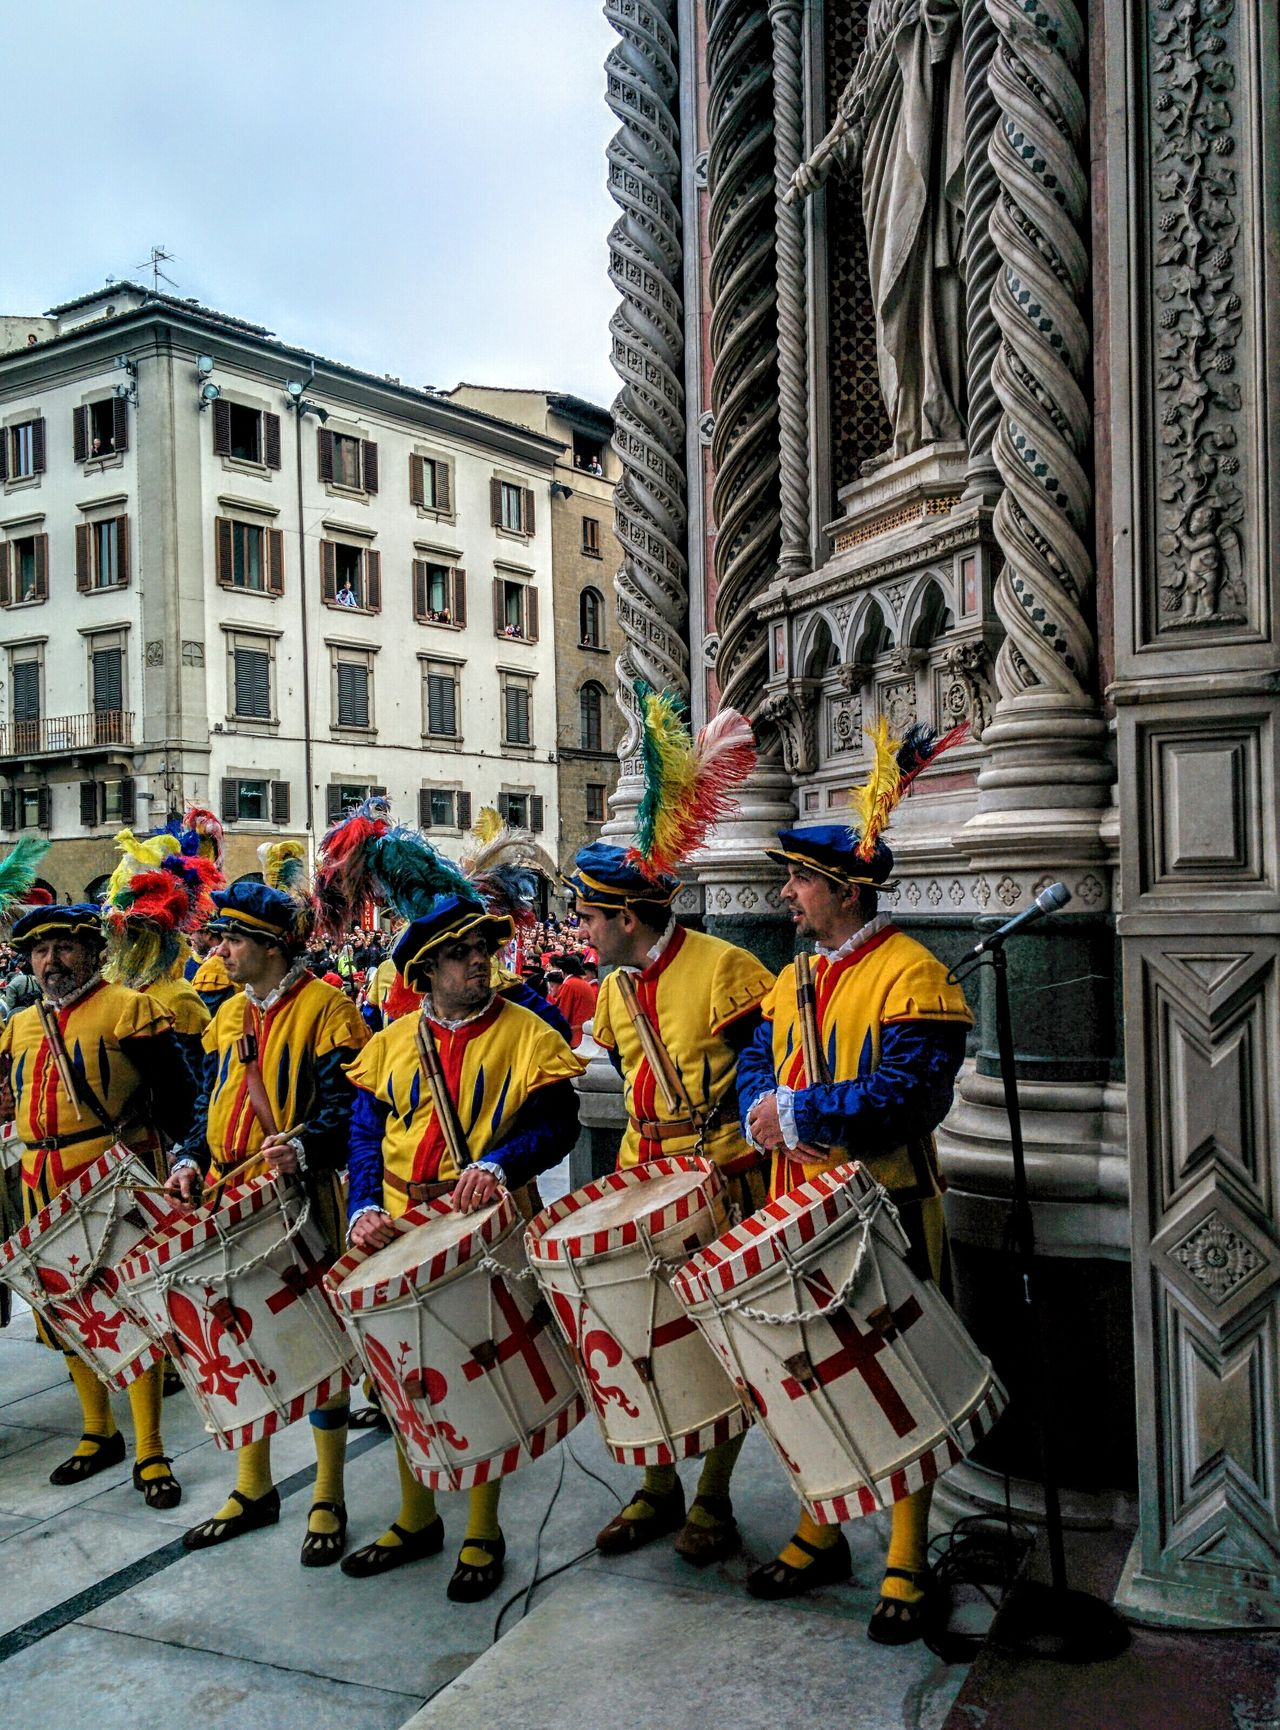 Beautiful stock photos of ostern, built structure, building exterior, parade, city